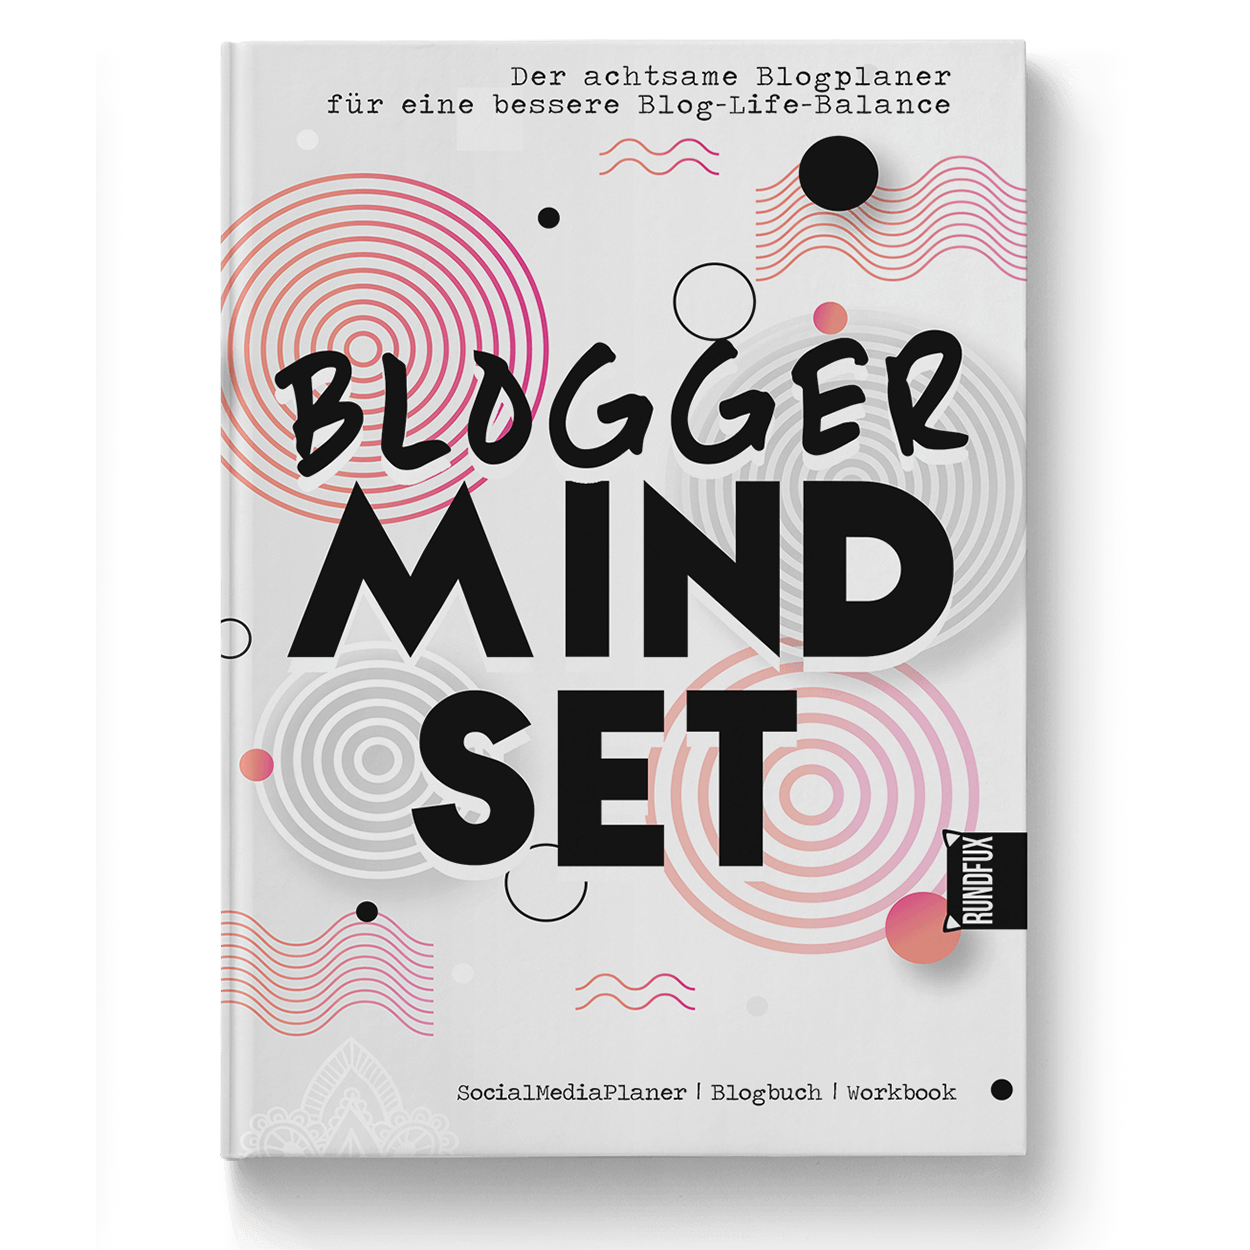 BloggerMindSet - Der achtsame Blogplaner